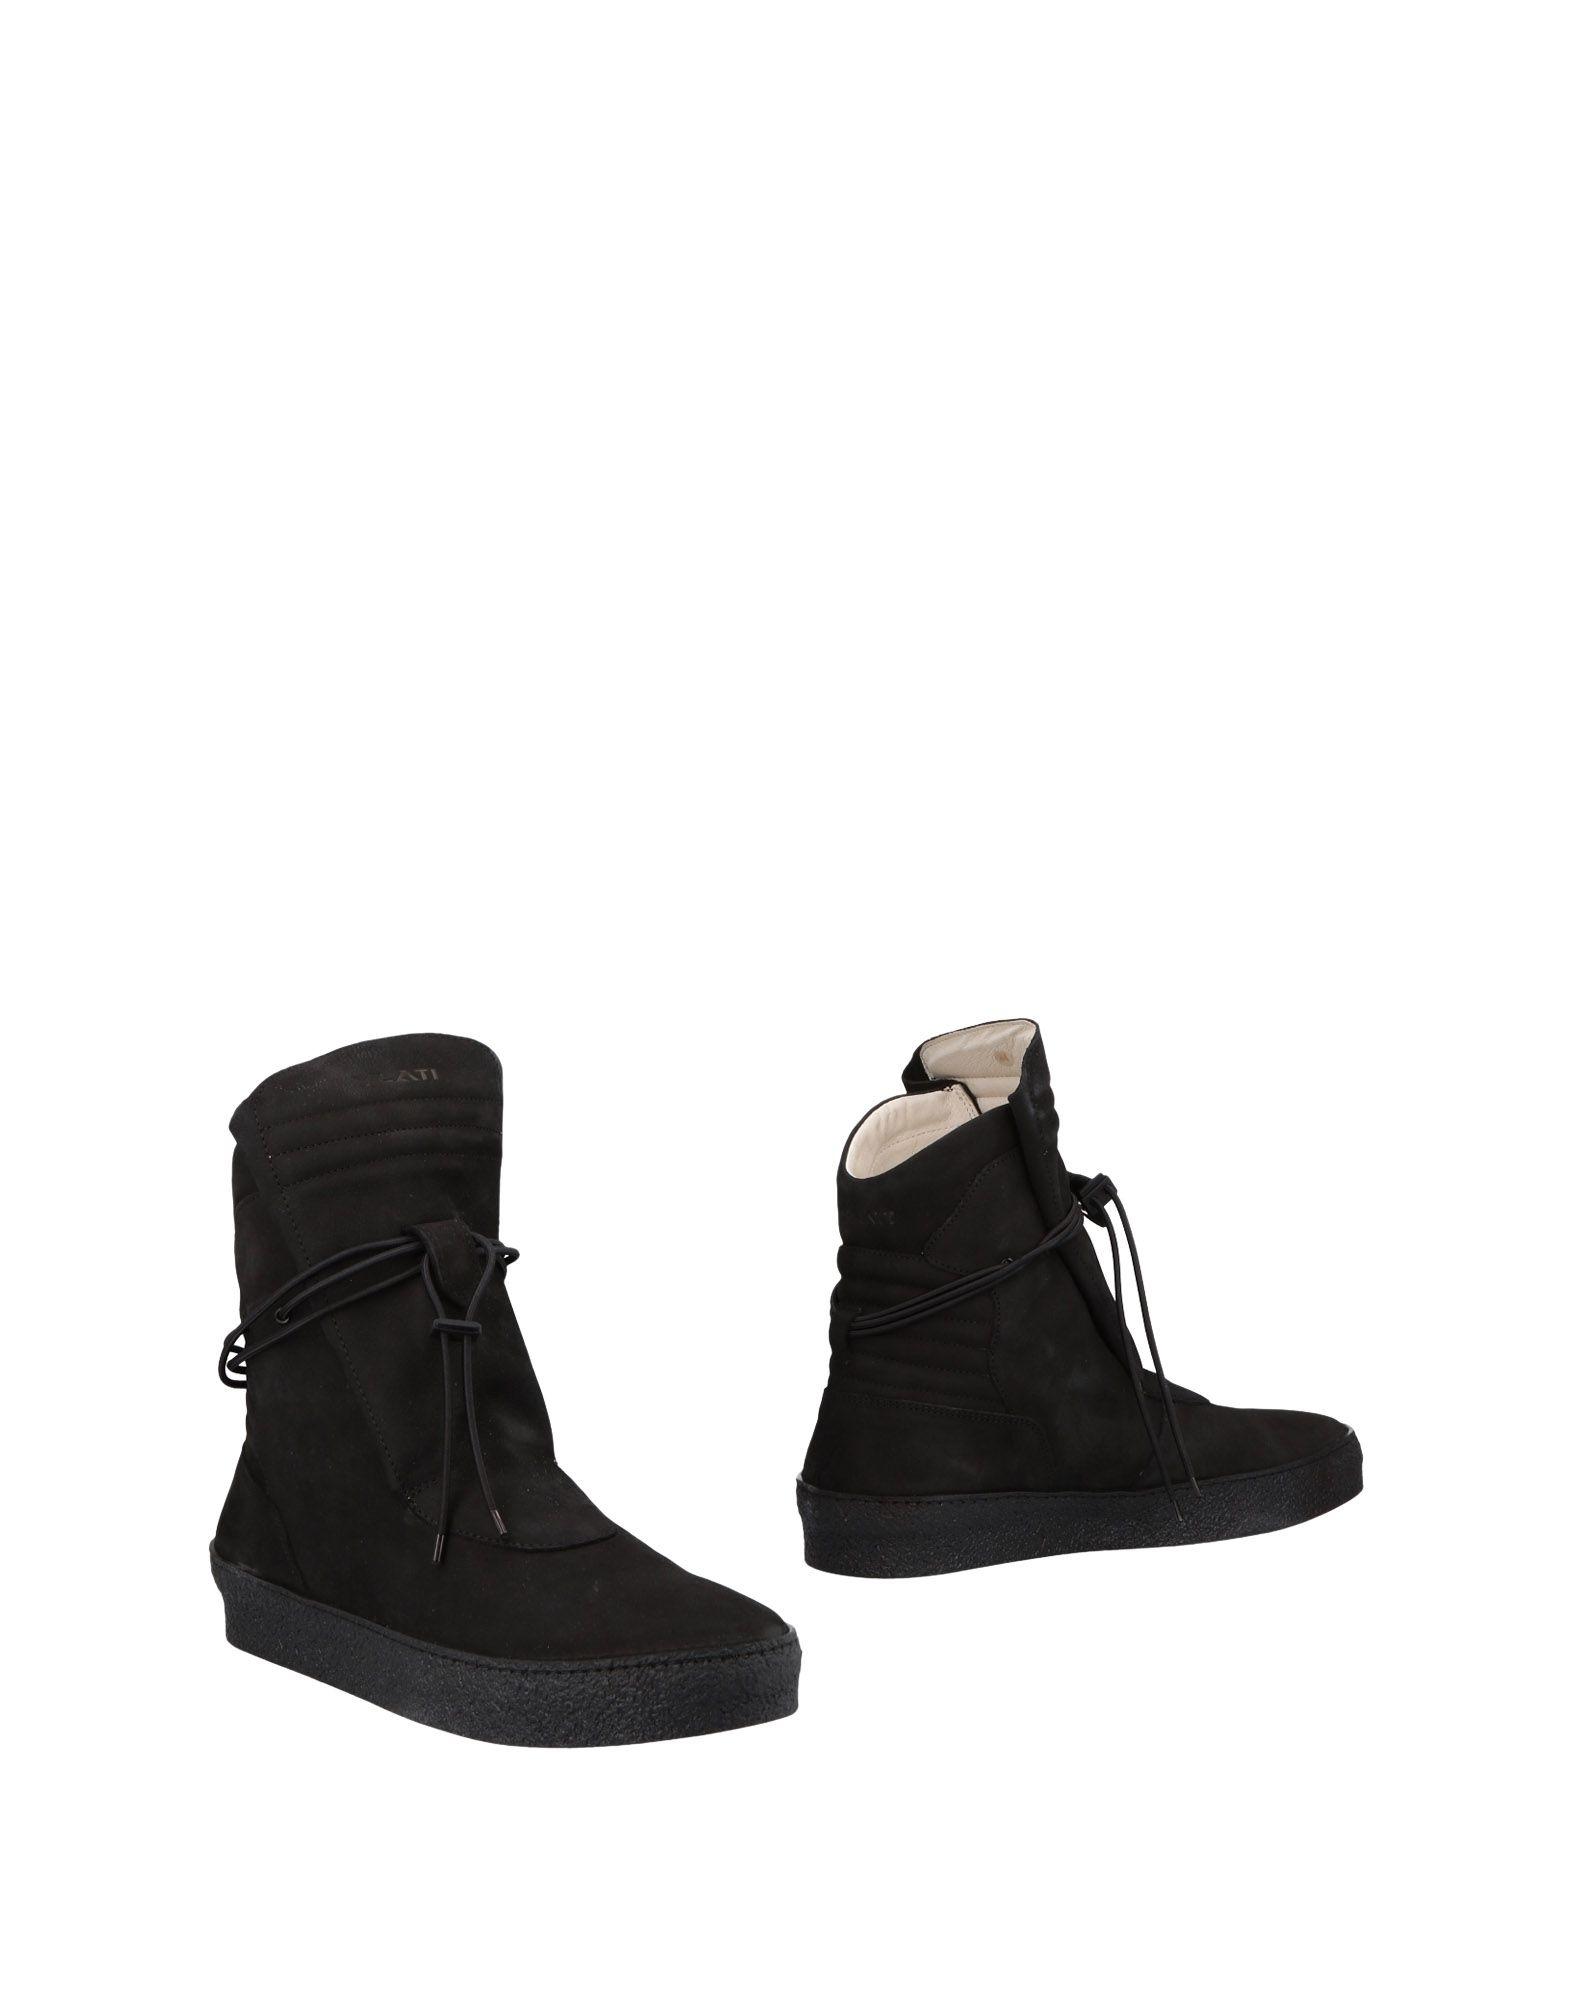 YLATI Boots in Black